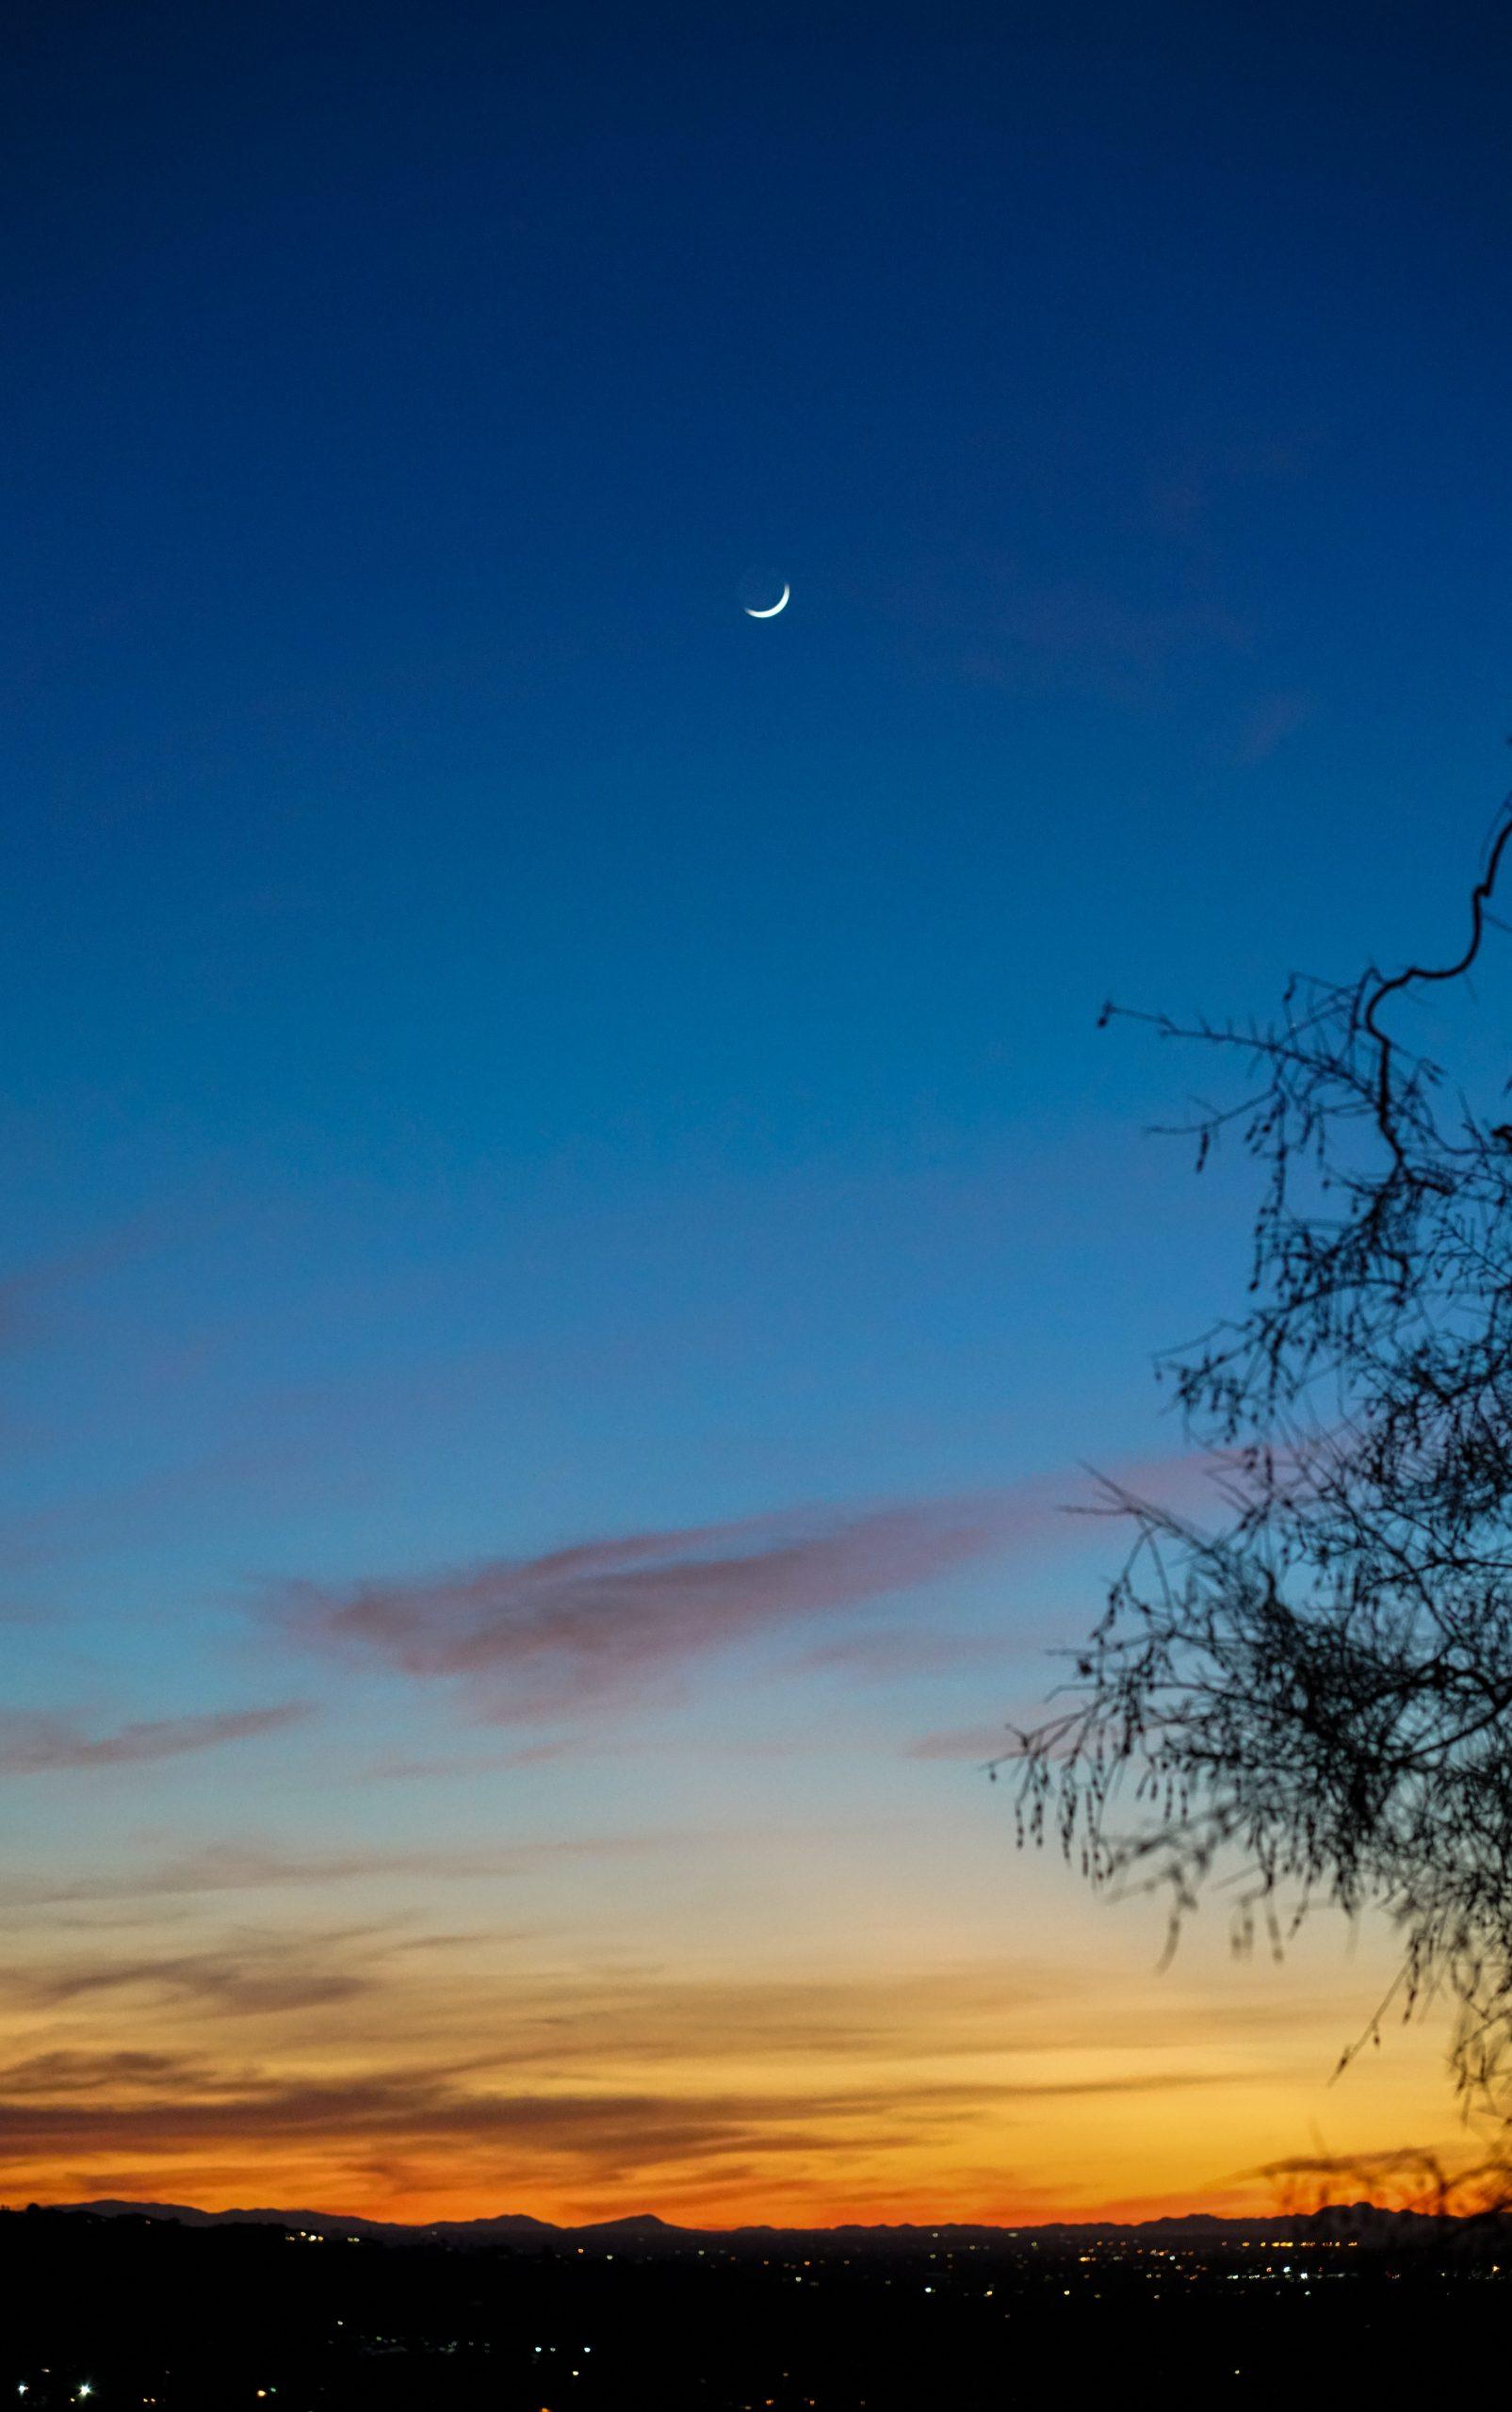 leafless tree under blue sky during daytime